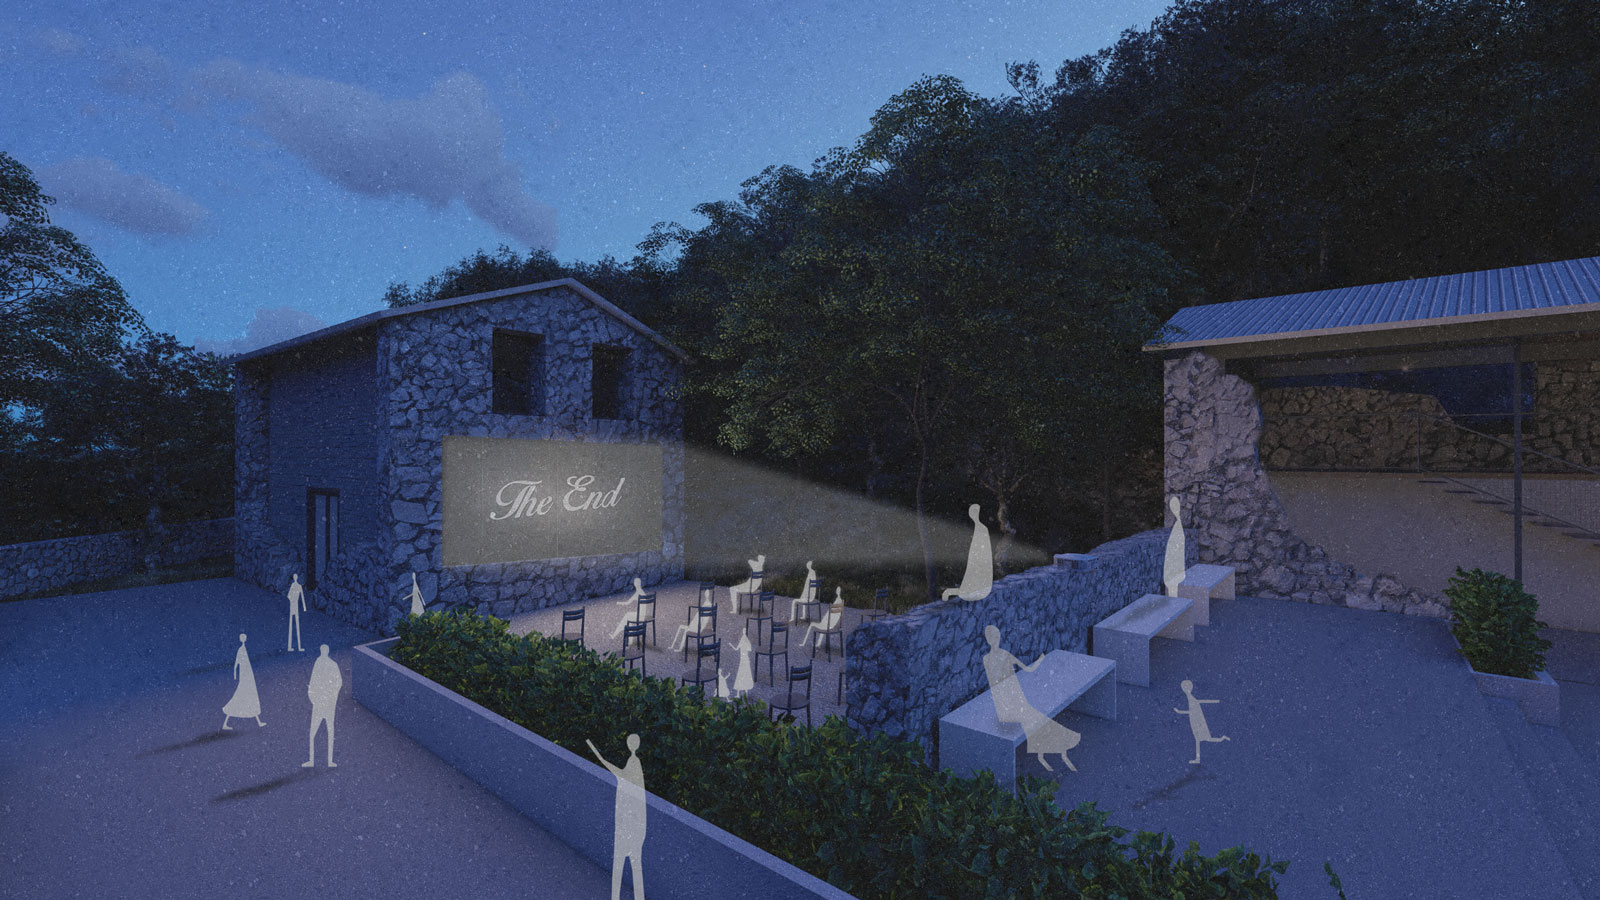 Villaggio Di Sale: The Revival of the Abandoned Settlement / Sofia Mikroni + Aristea-Evangelia Koukounouri